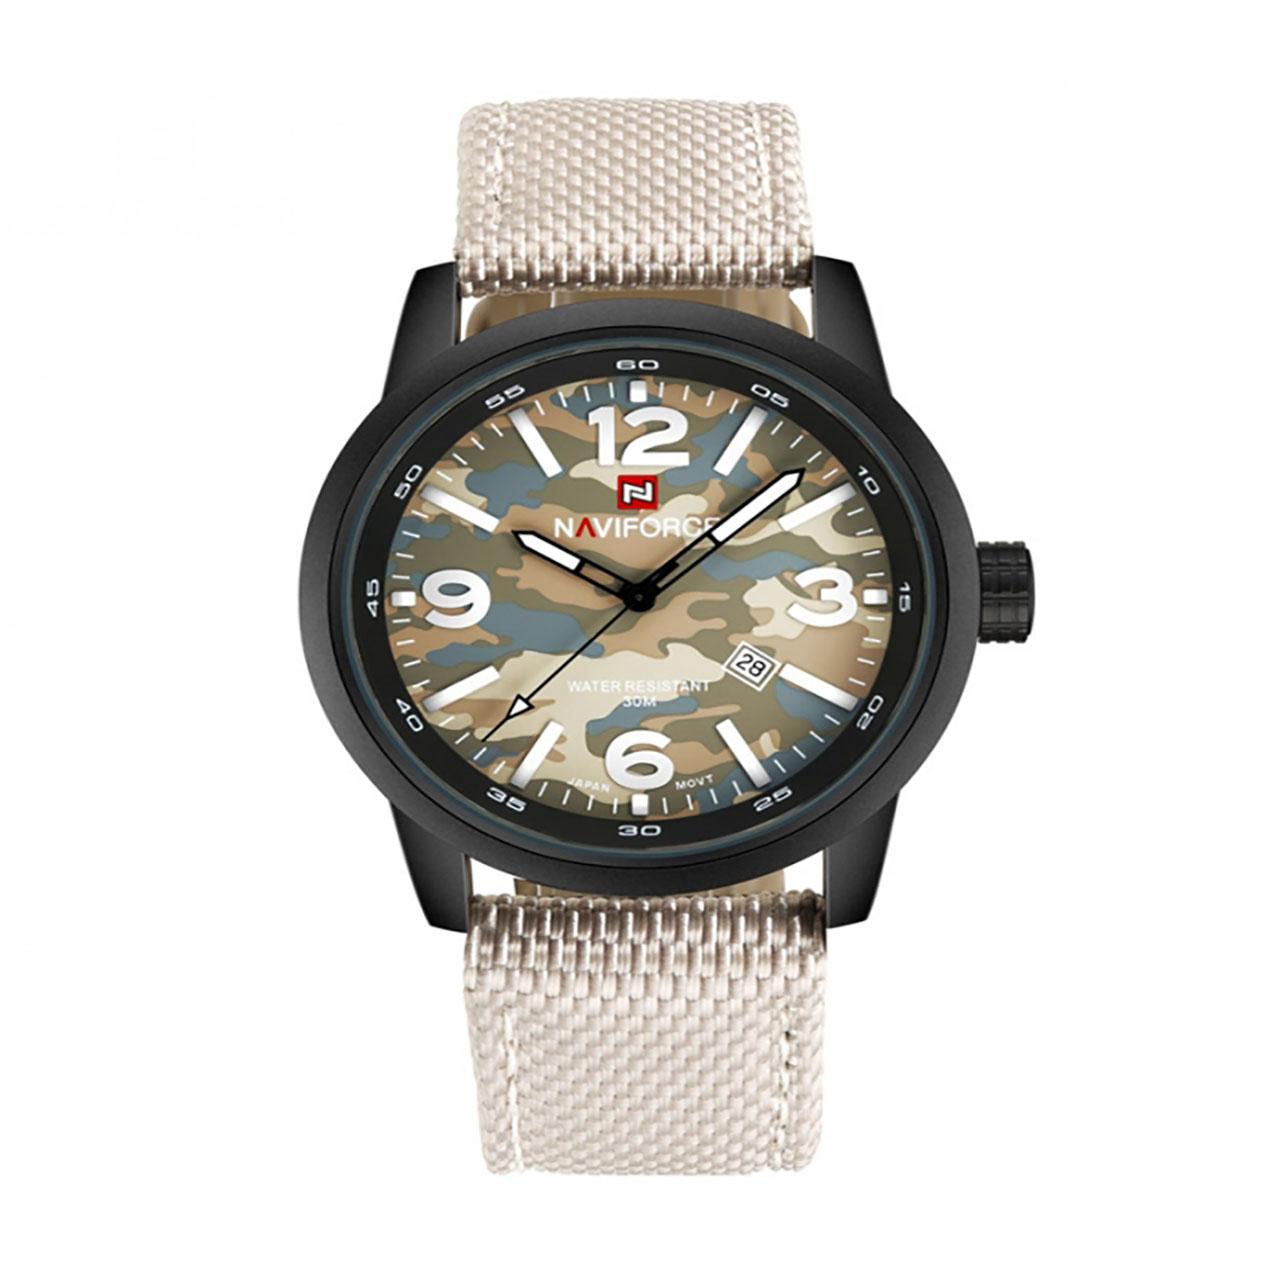 ساعت مچی نیوی فورس مردانه مدل nf9080